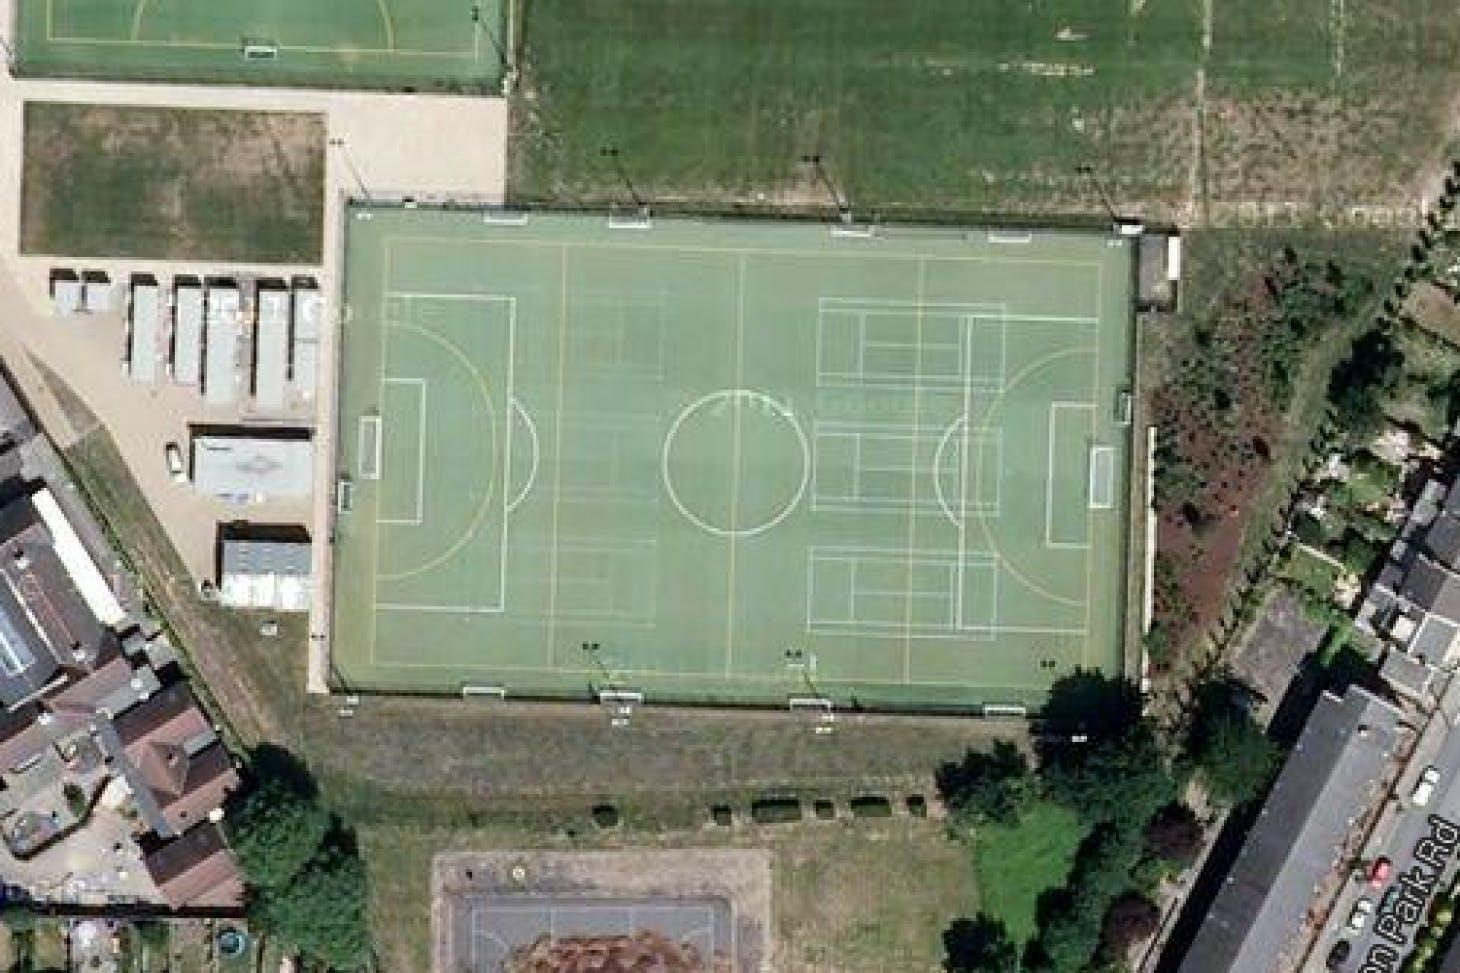 Honour Oak Park 11 a side | Astroturf football pitch